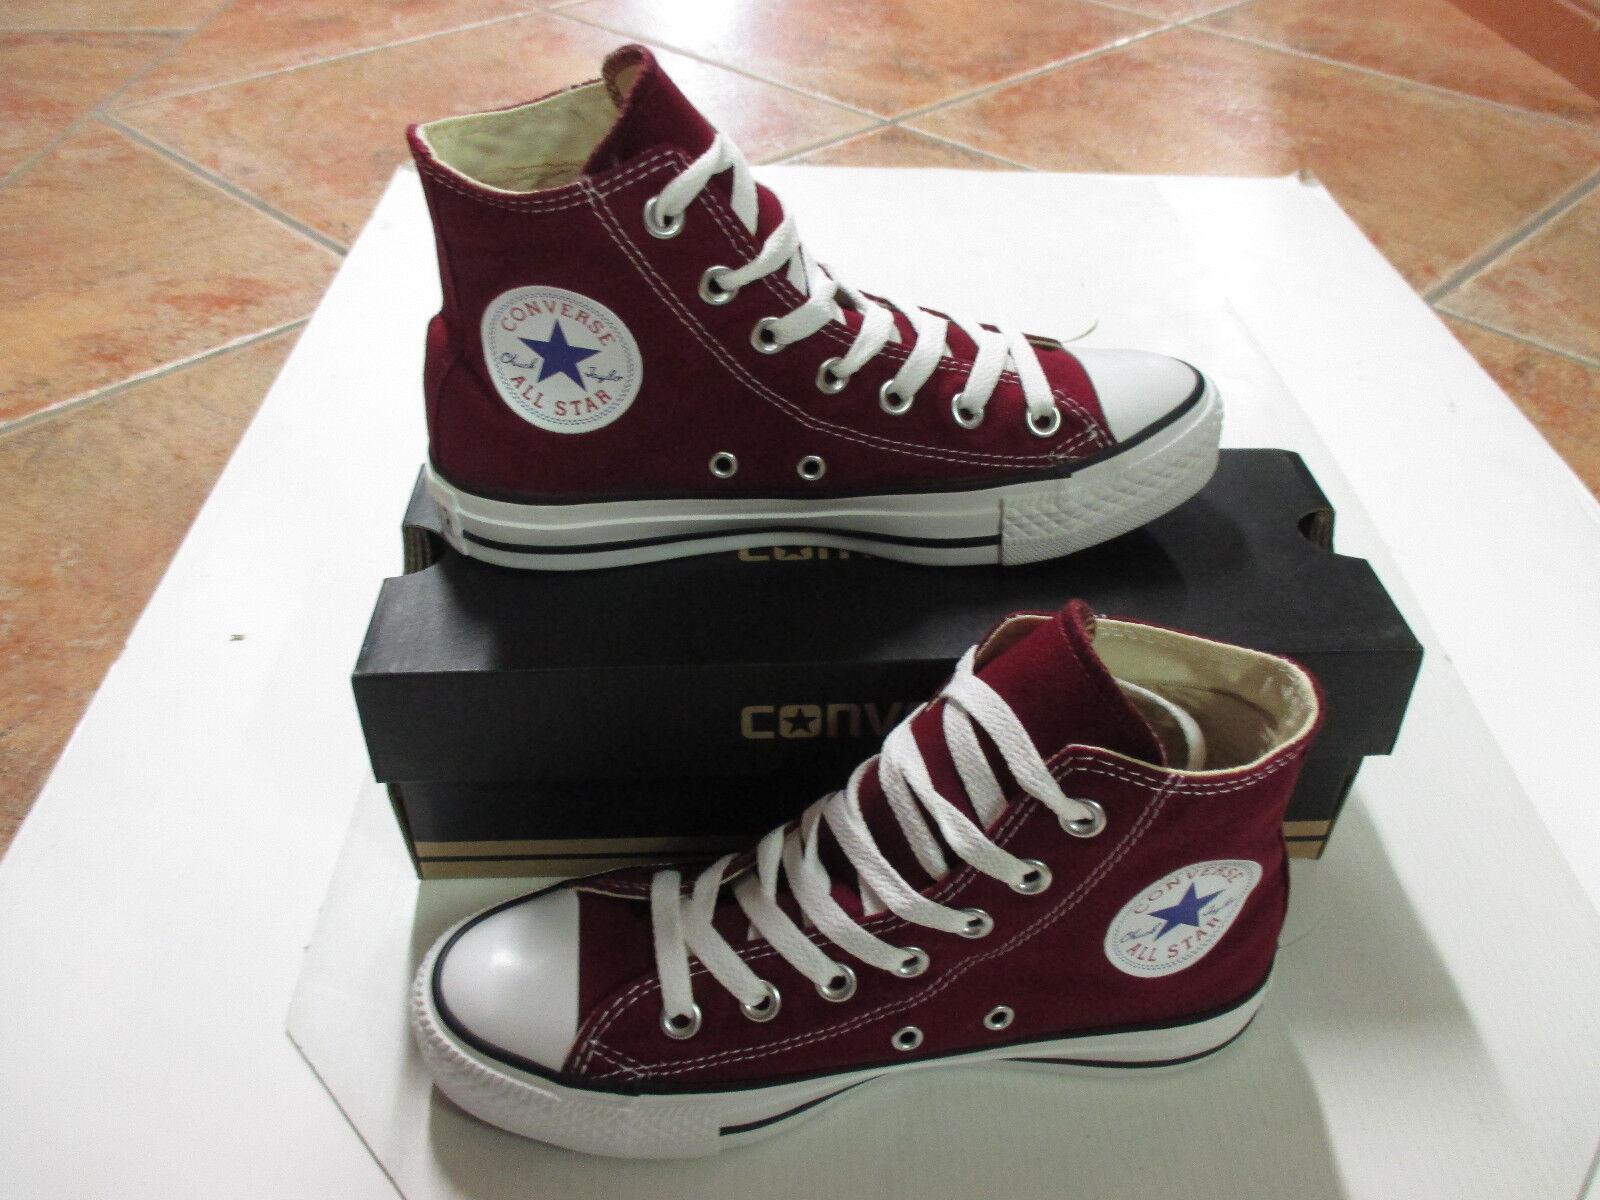 Converse Chucks All Star HI Größe 36,5 Maroon weinrot M9613C Neu Sneaker